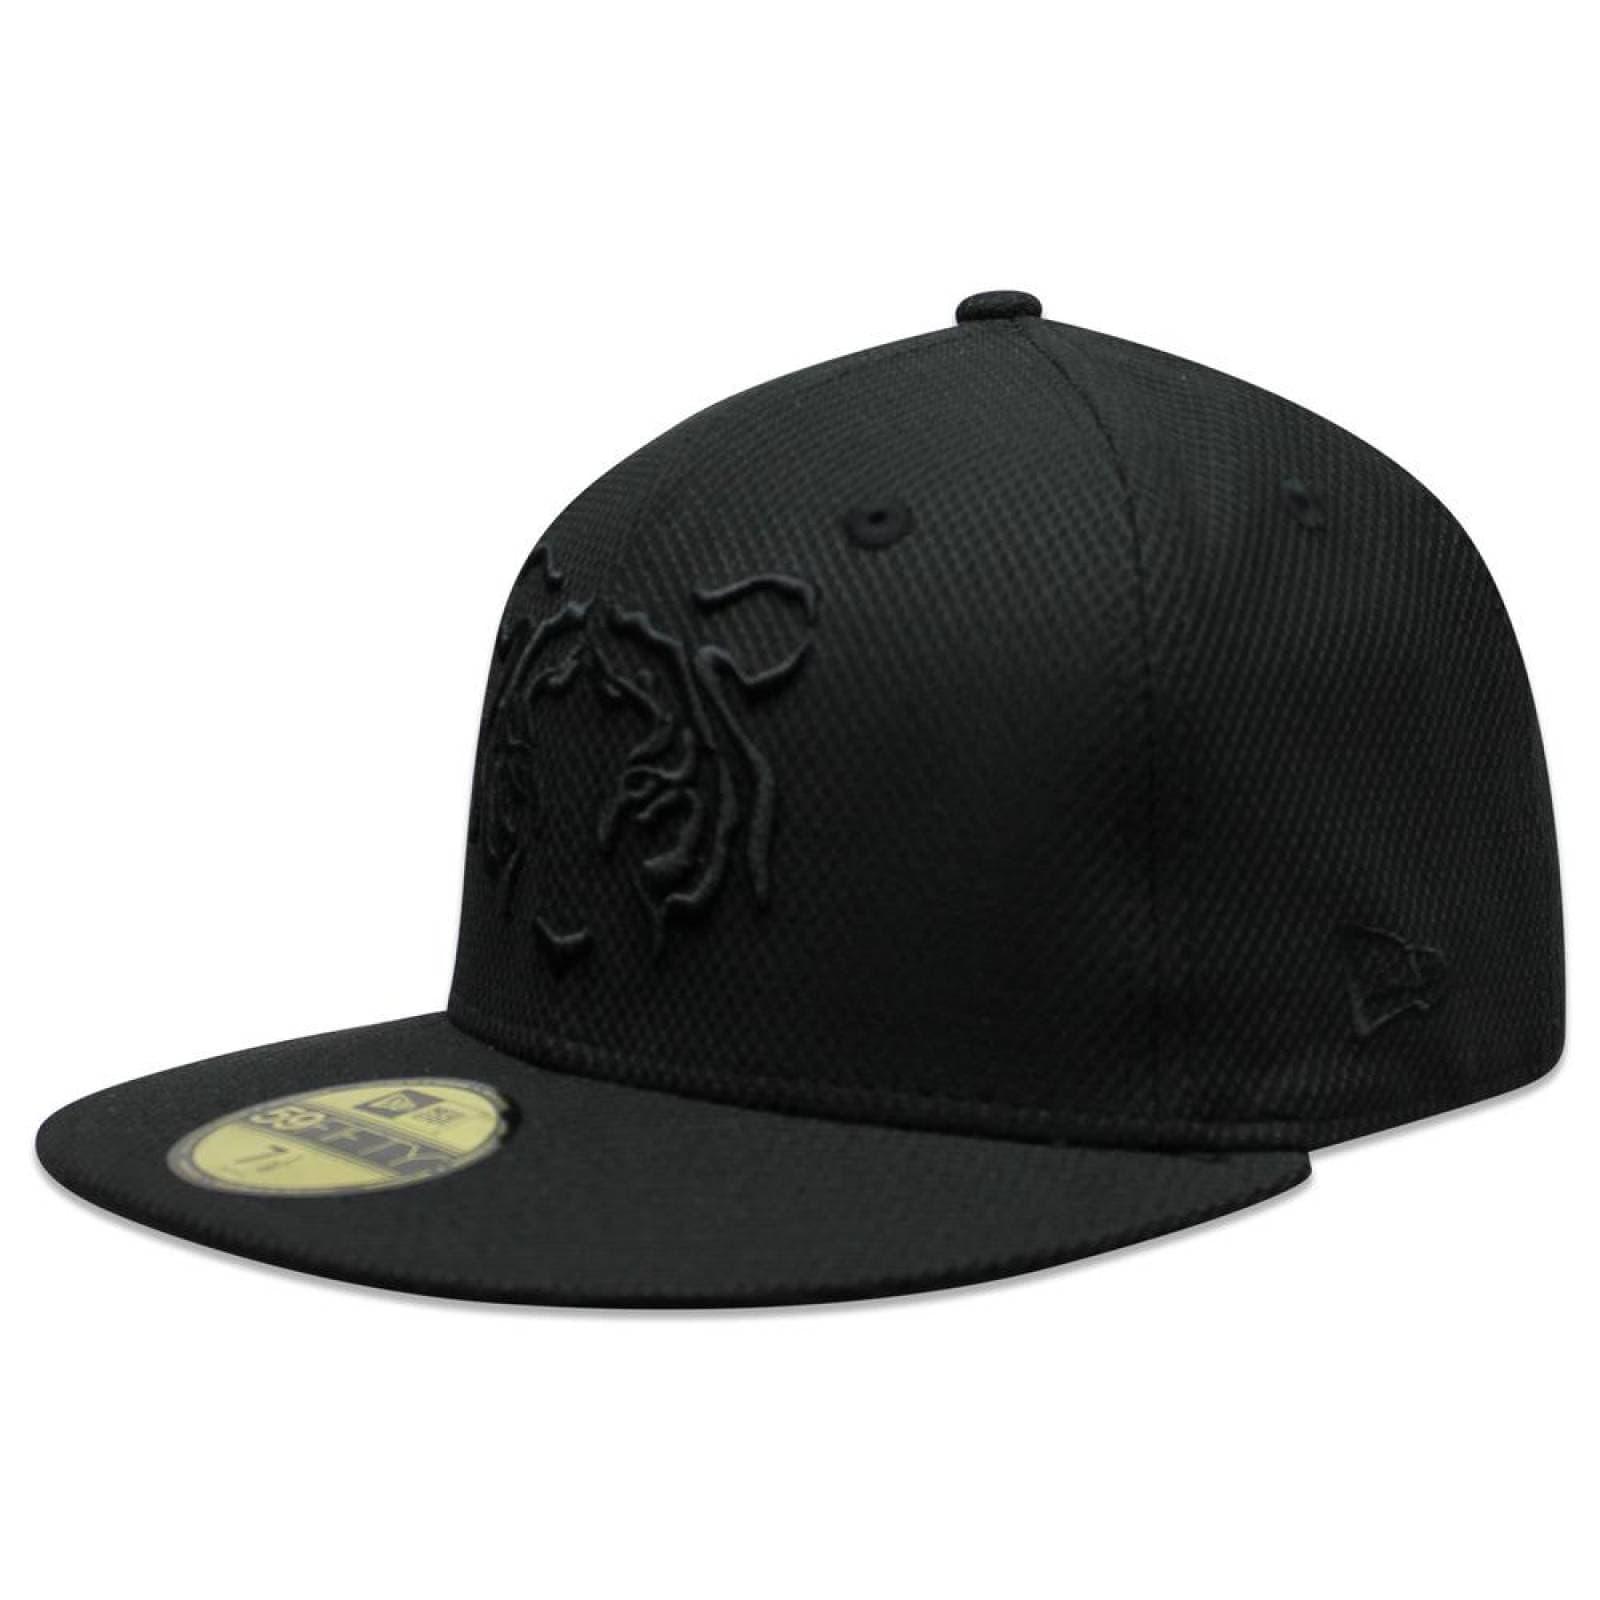 Gorra New Era 59 Fifty LMX Tigres Black On Black